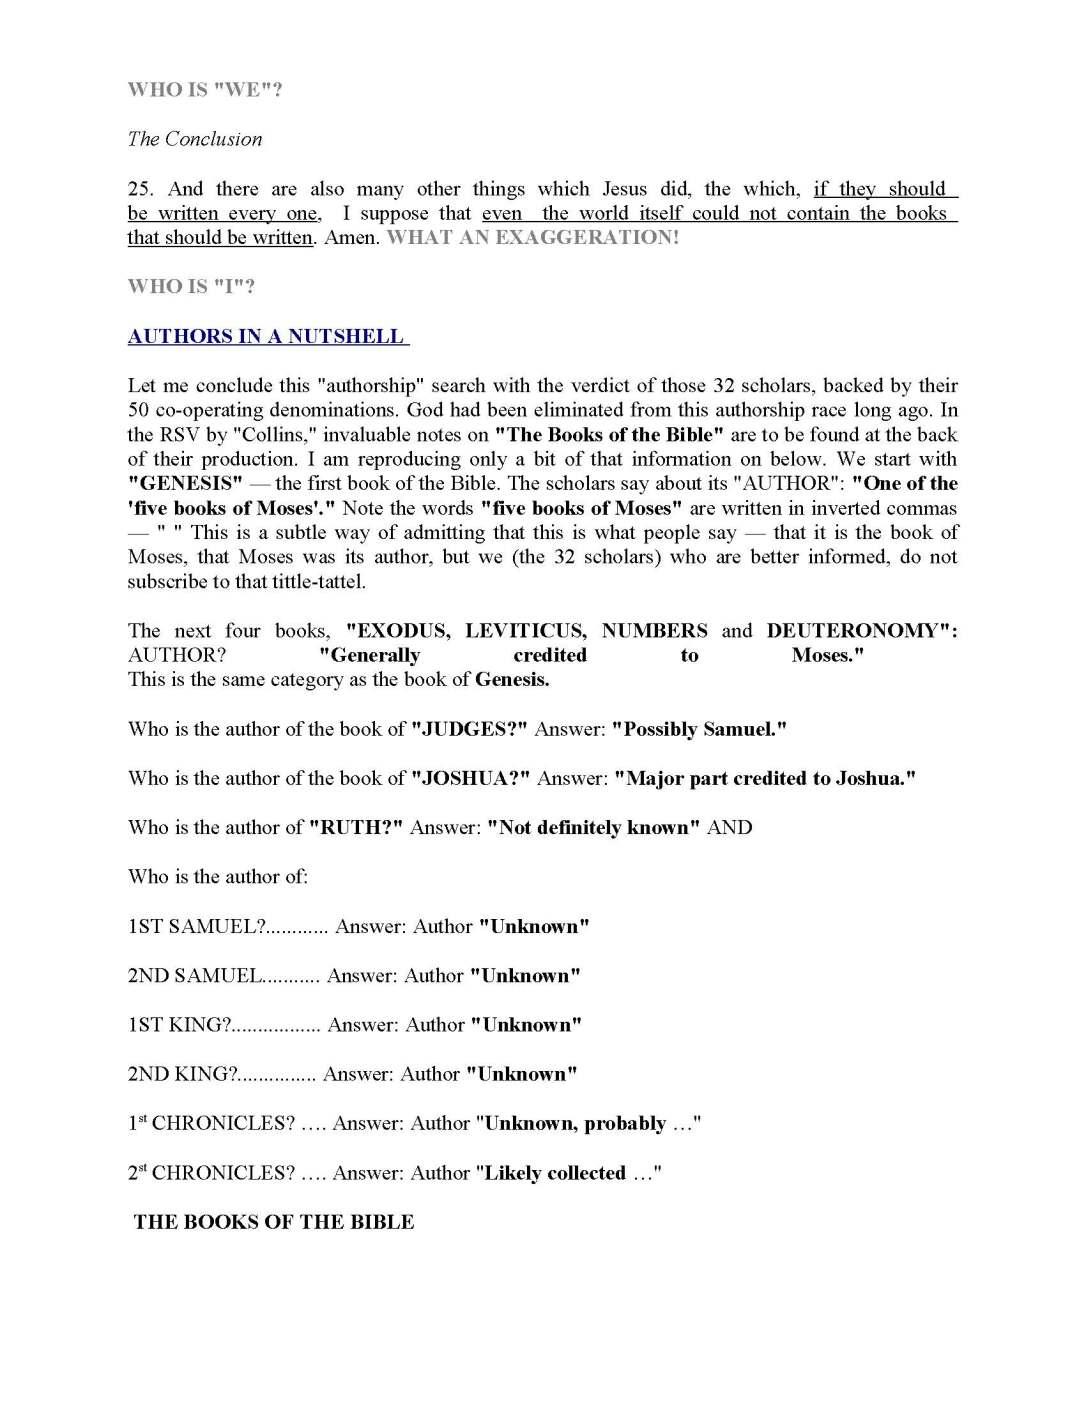 Is The Bible Gods Word [deedat]_Page_42